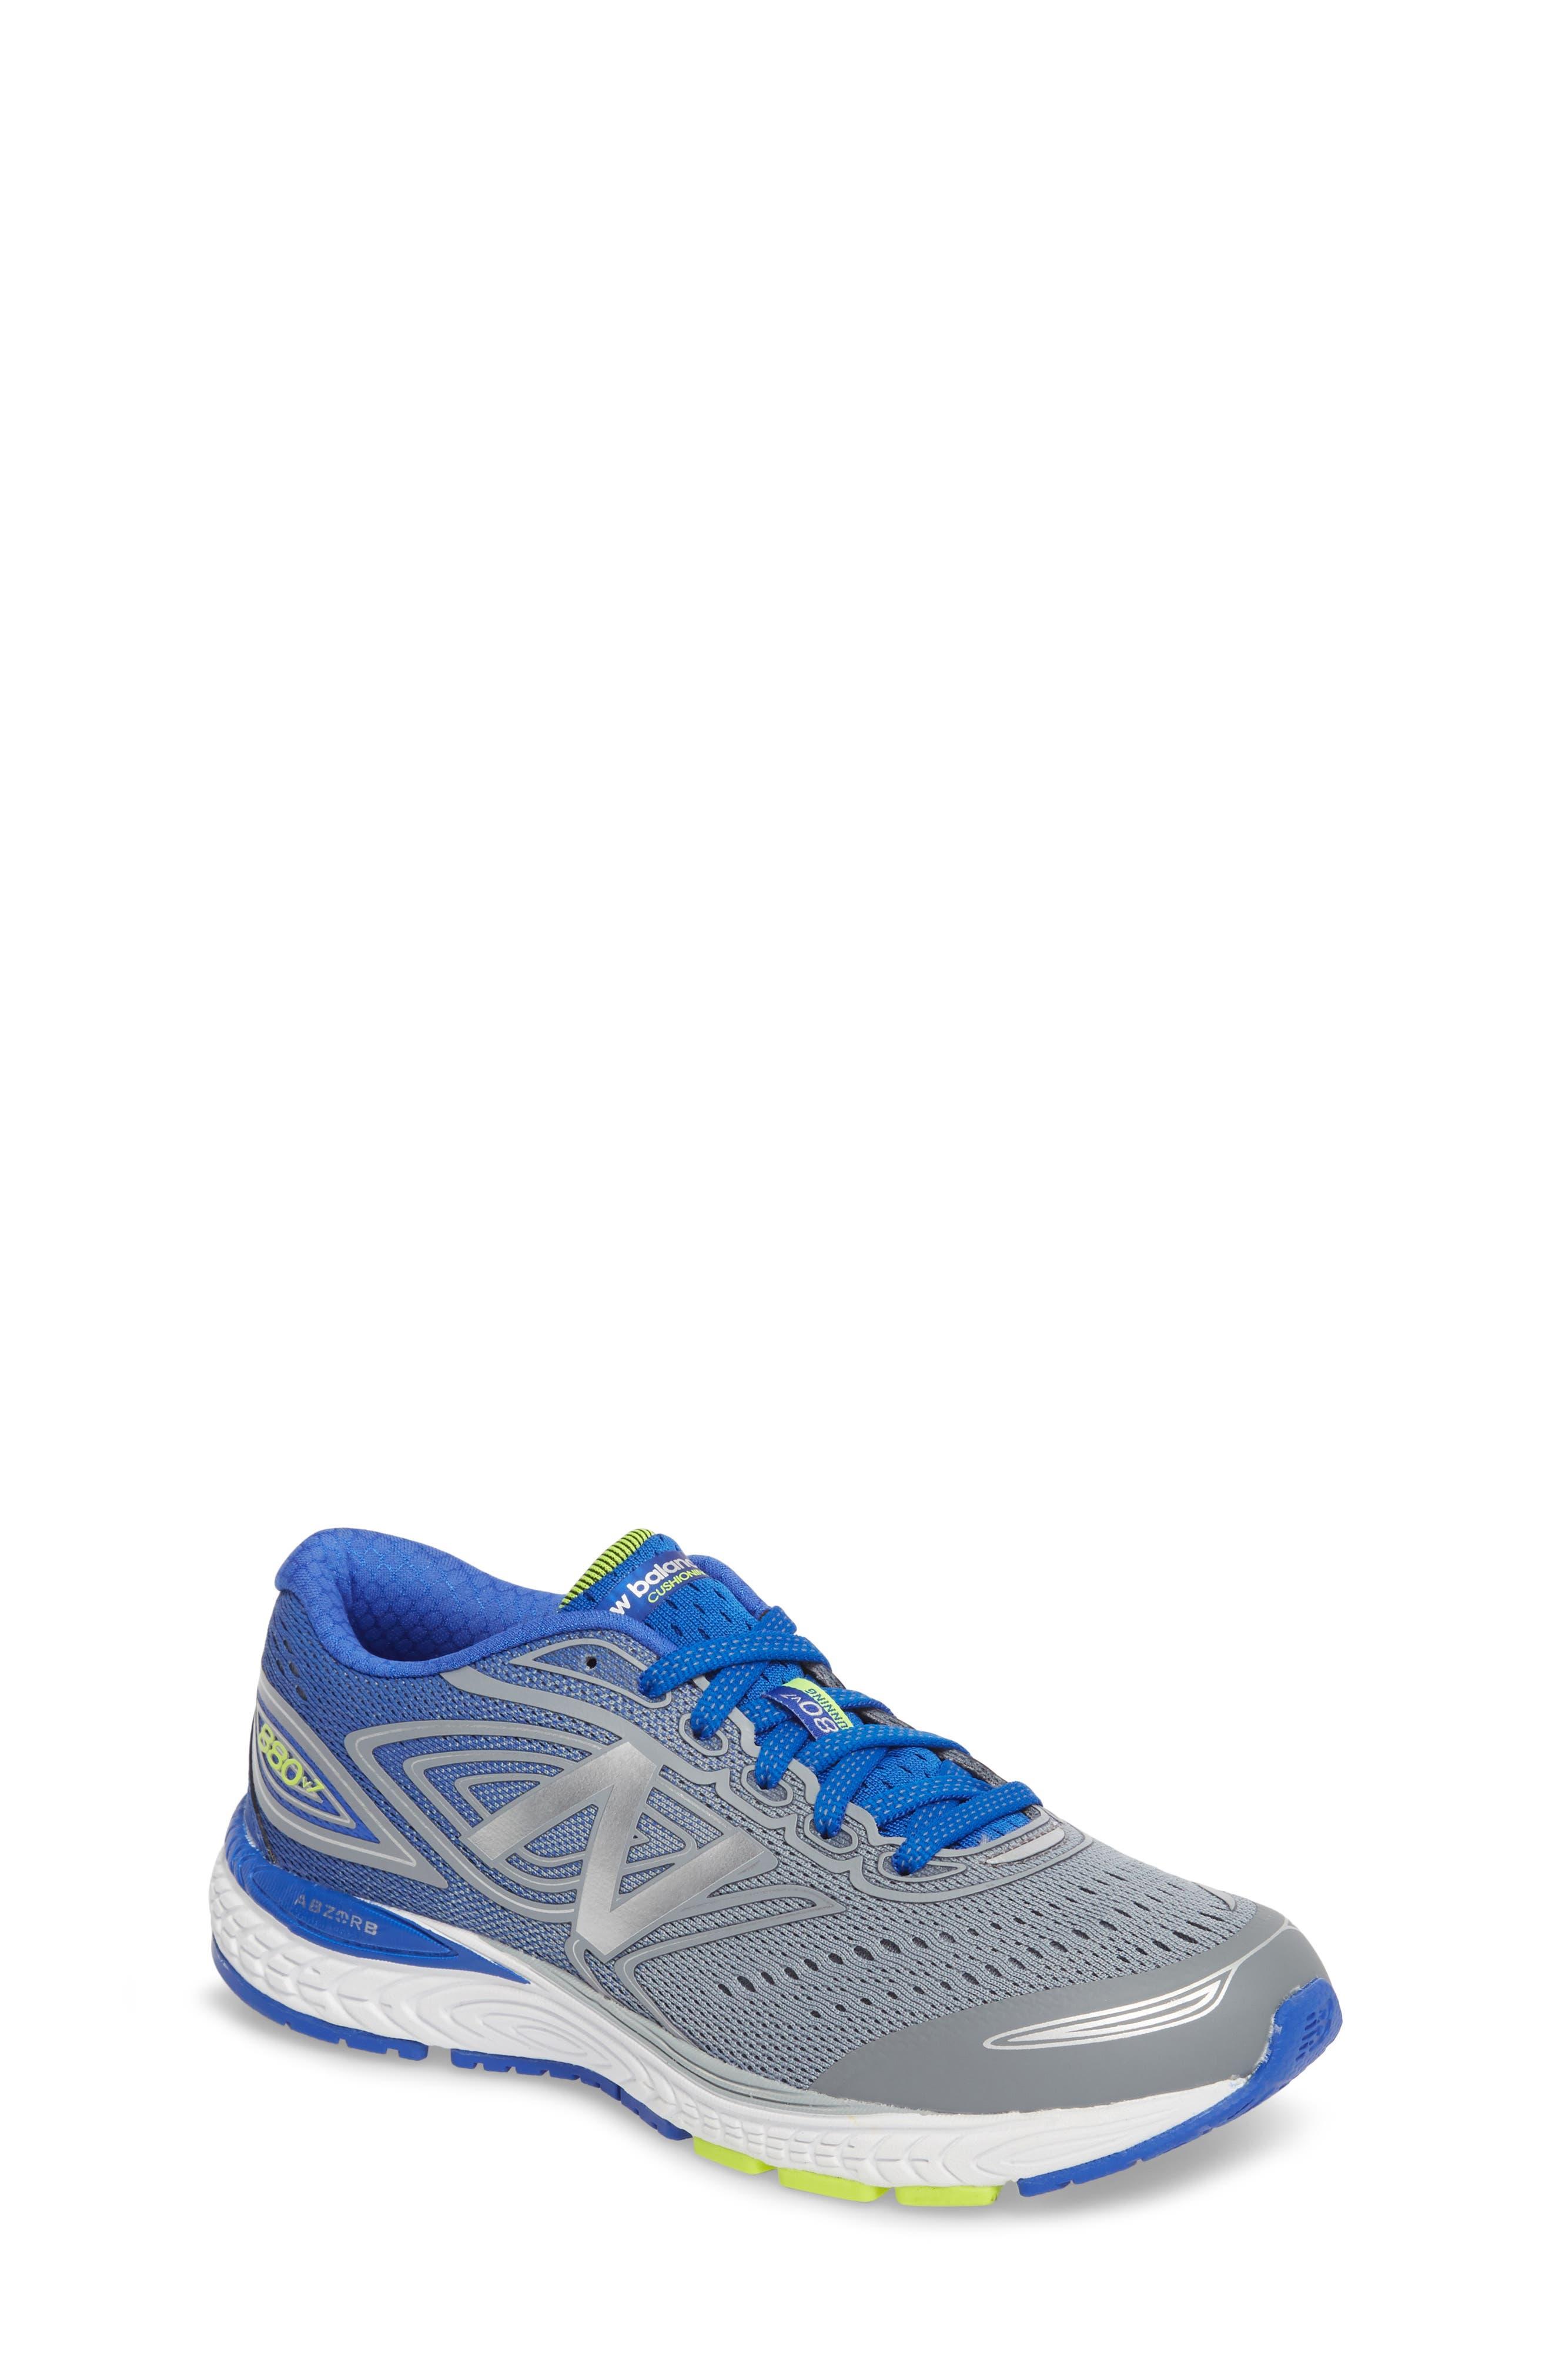 880v7 Sneaker,                         Main,                         color, STEEL